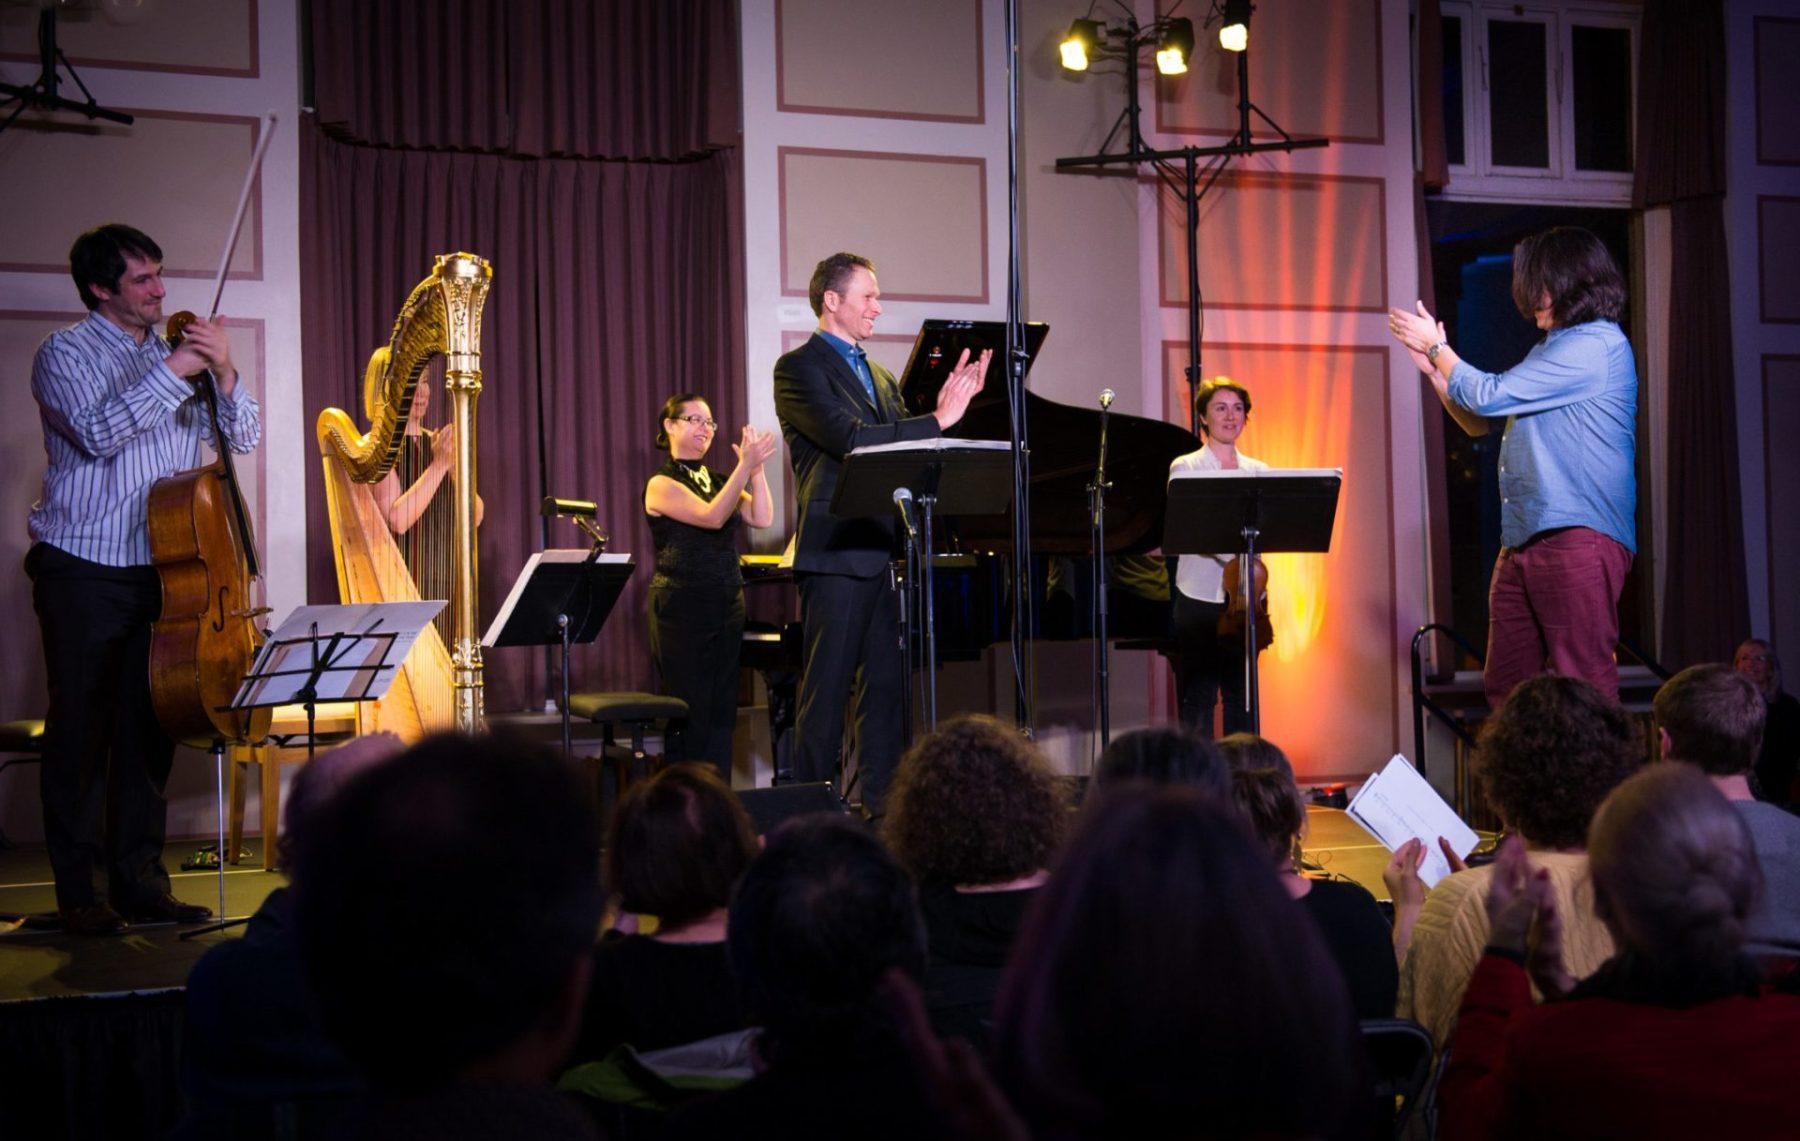 Ariel Barnes, Heidi Krutzen, Rachel Kiyo Iwaasa, Steve Maddock, Caroline Shaw & Alfredo Santa Ana, Music for the Winter Solstice 2014